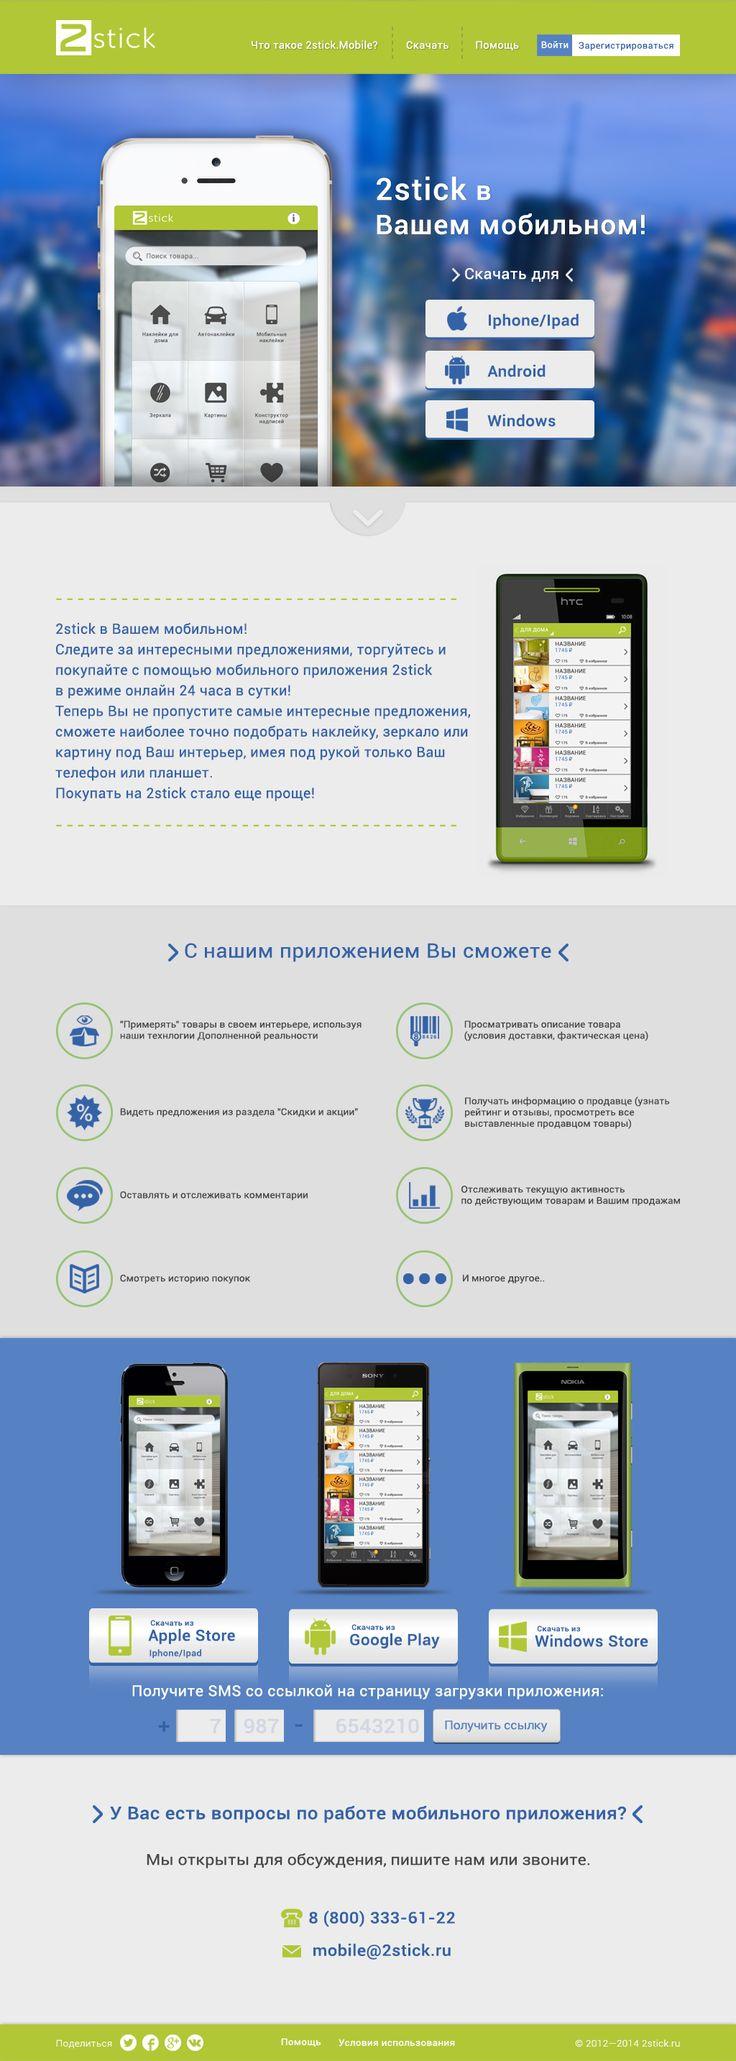 2stick mobile app landing page - http://artzoomi.com/